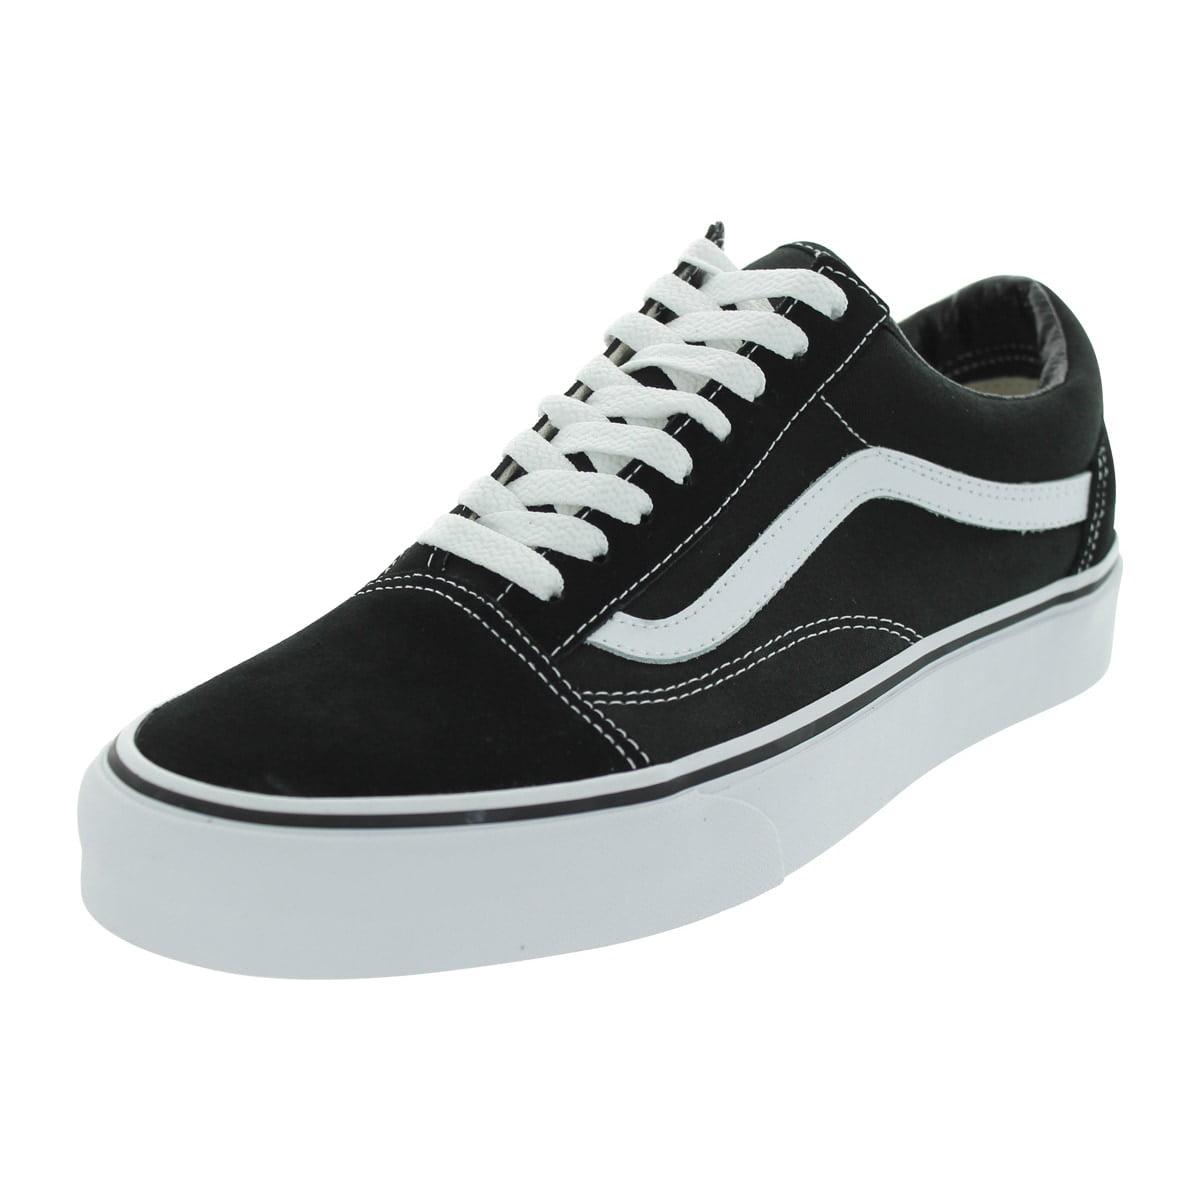 bd24ba9801dd0d Vans - Unisex Old Skool Skate Shoe - Walmart.com